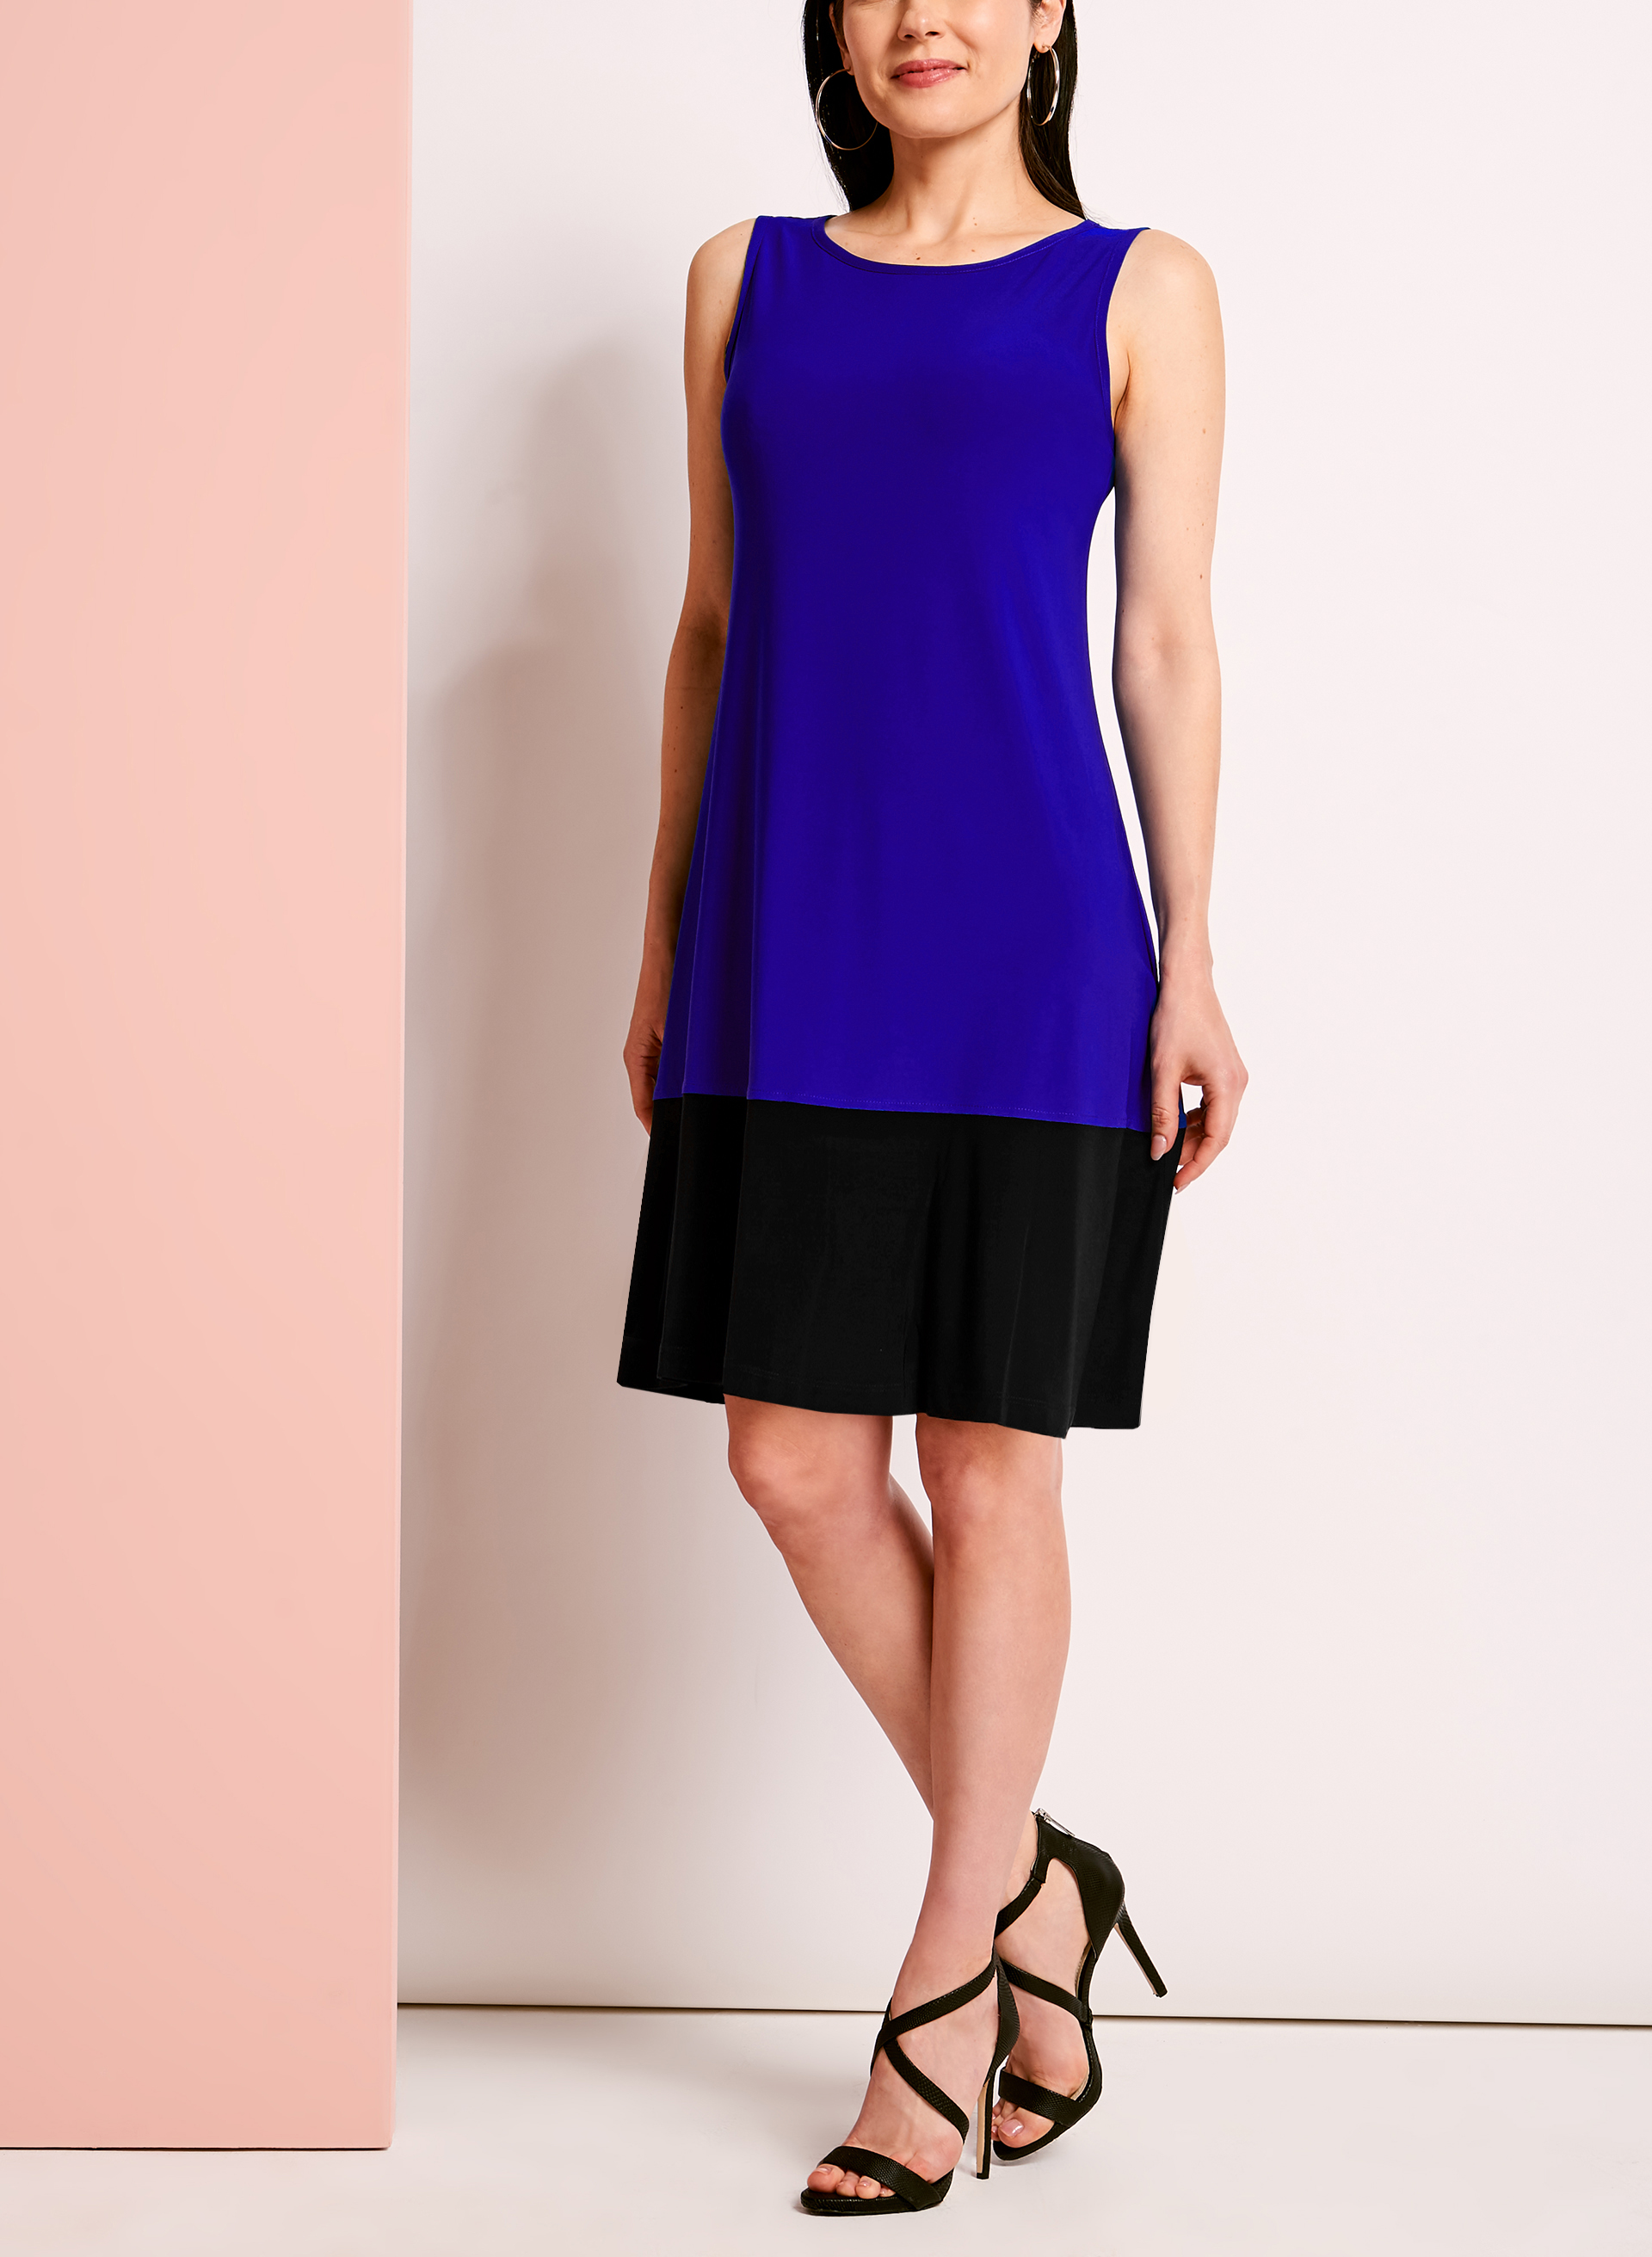 Sleeveless Colour Block Trapeze Dress  Free Shipping* Laura